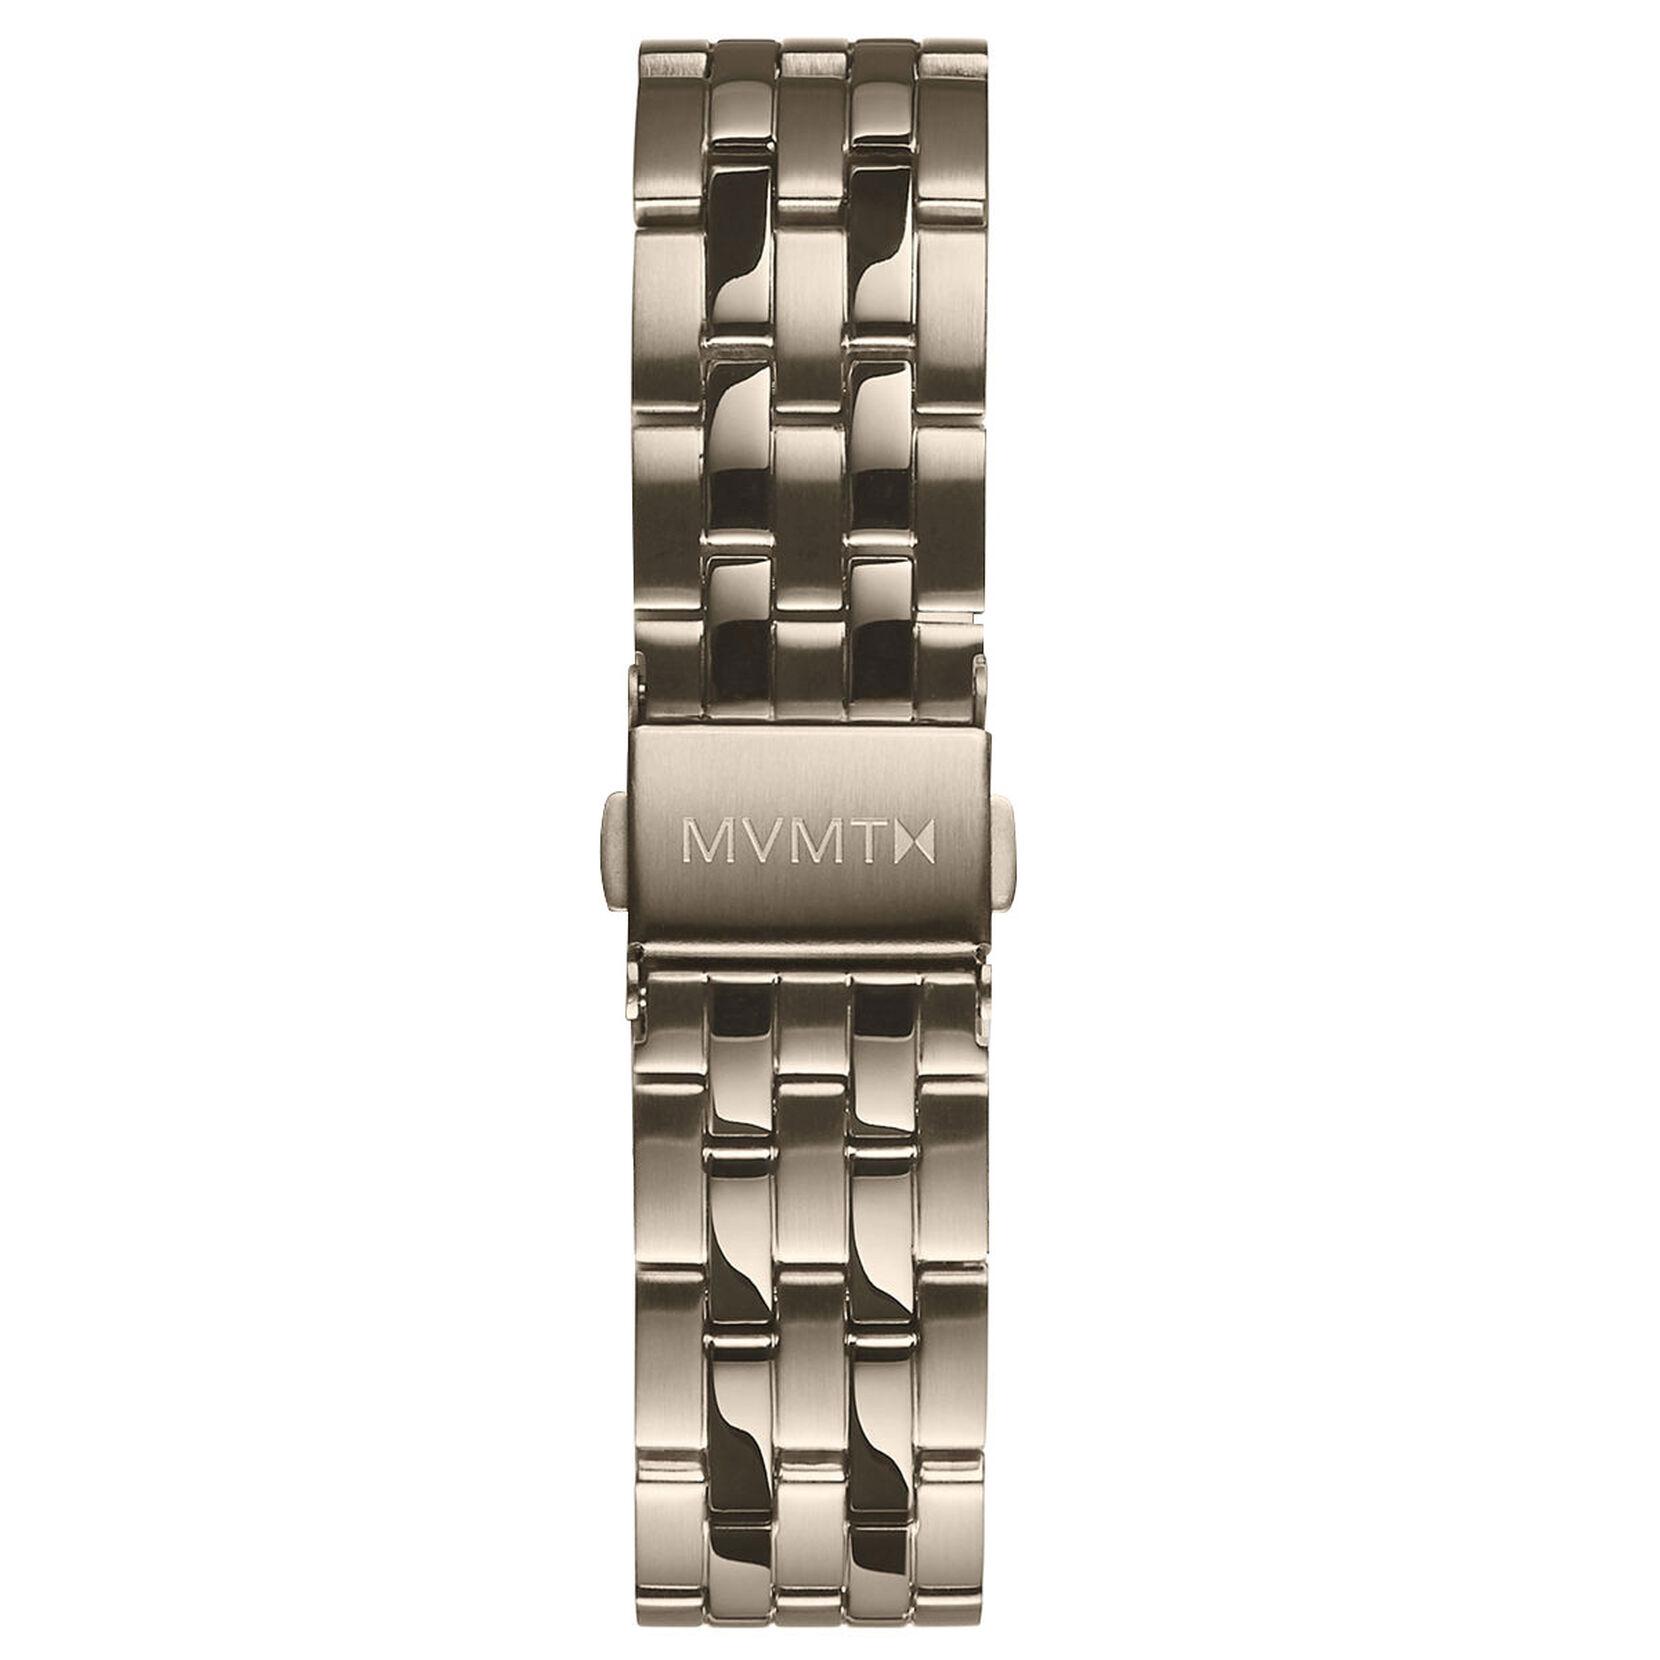 Signature Square - 16mm Steel Band